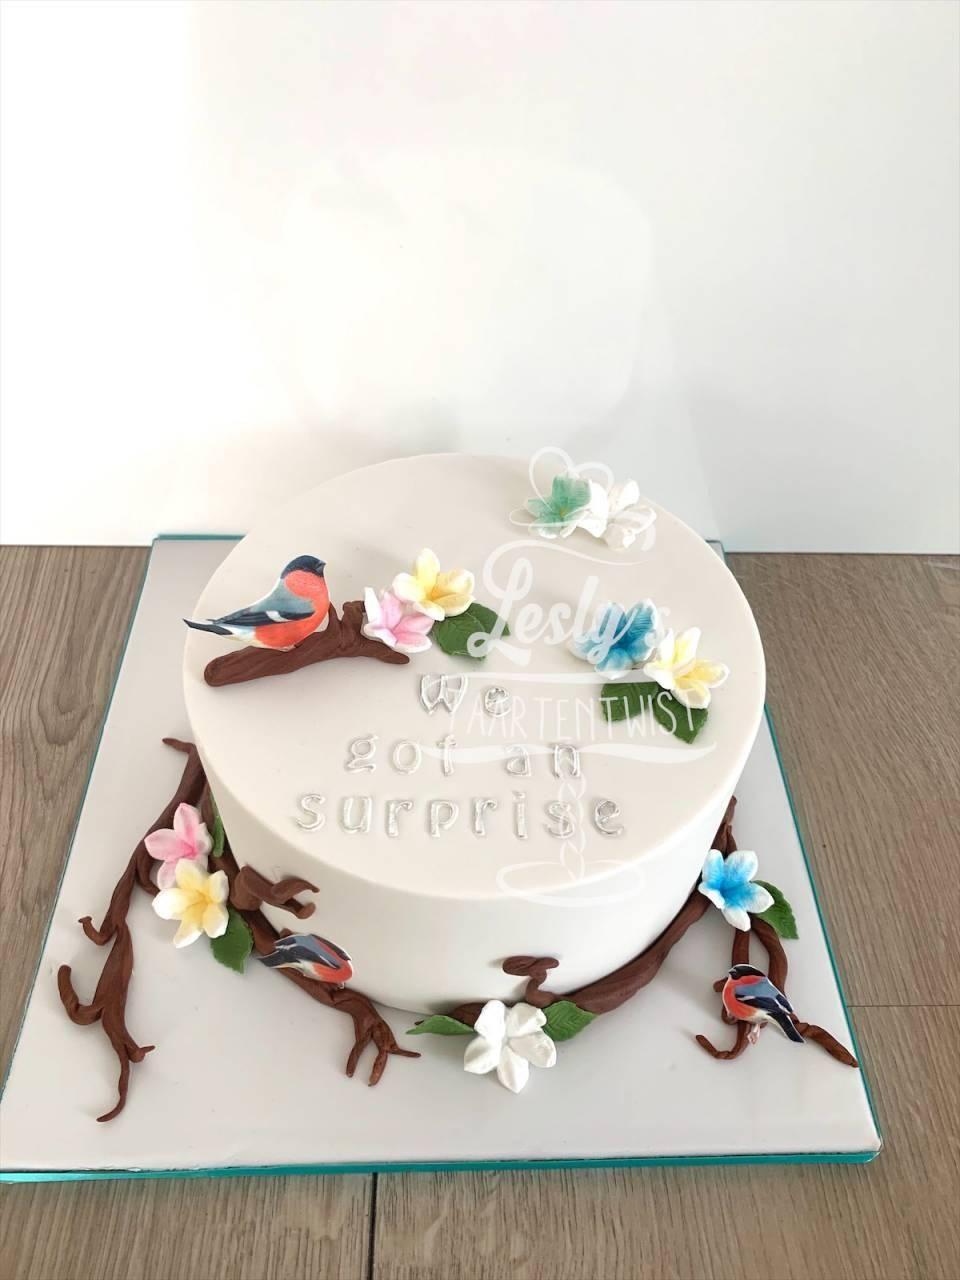 reveal-cake-bird